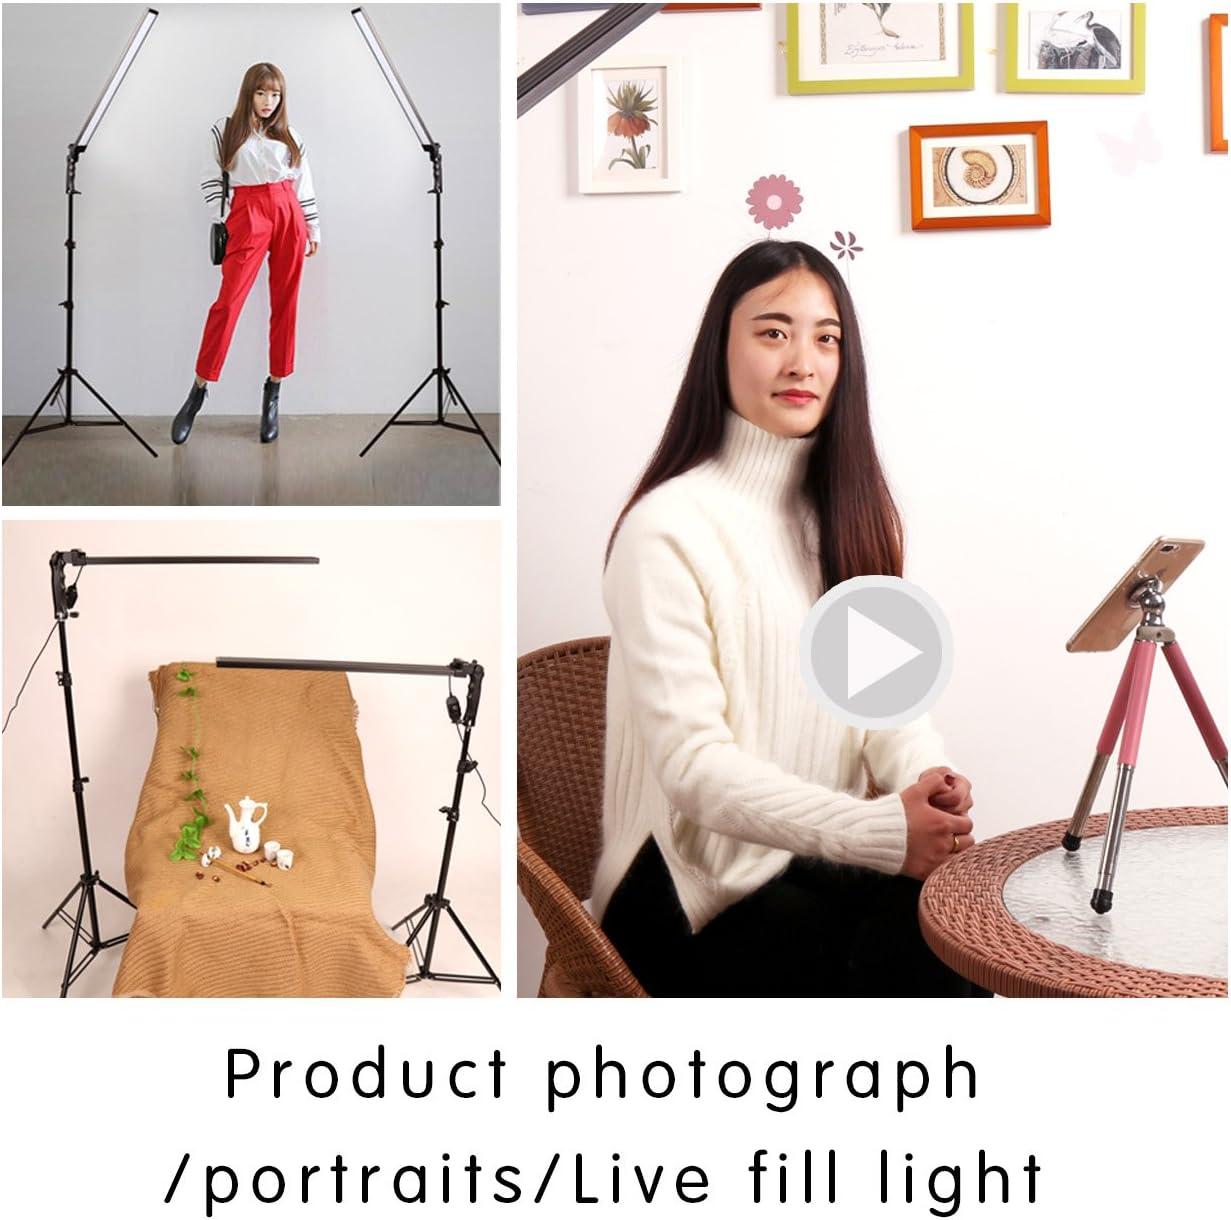 GSKAIWEN 24W 3200-5500k brightness color temperature adjustable with desktop soft tube clamp yutube live beauty makeup selfie portrait blogging photography light